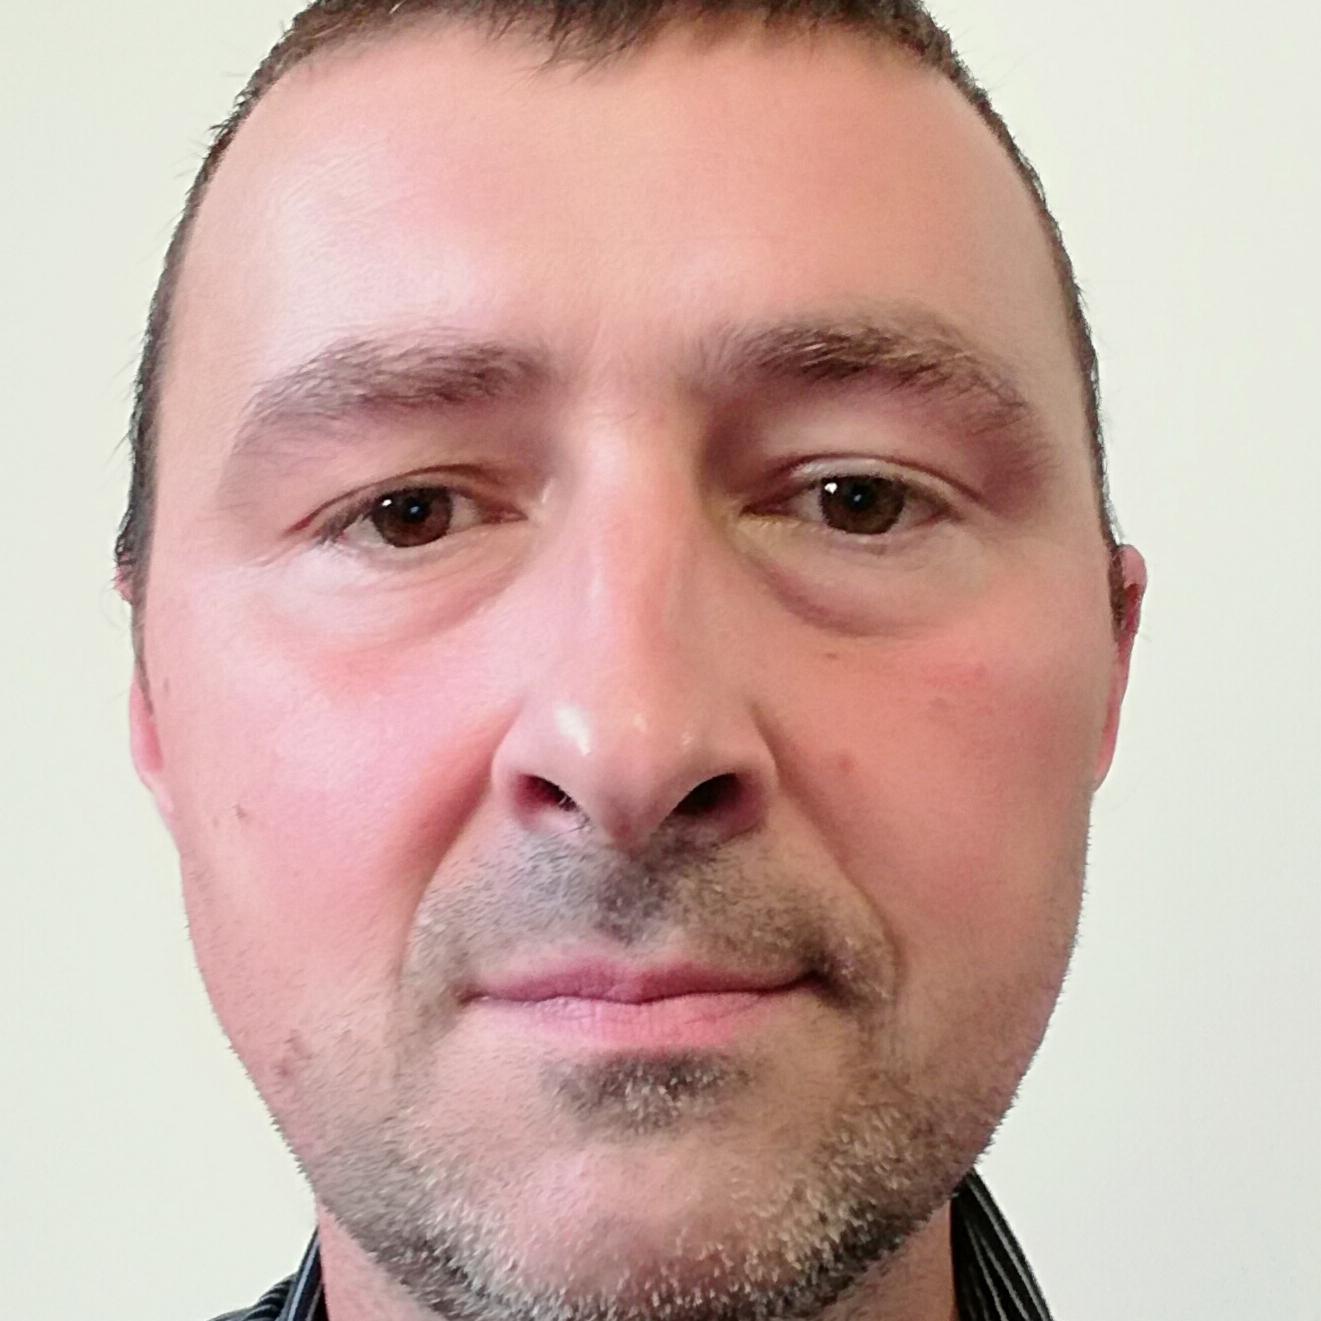 Jasenko Krejic